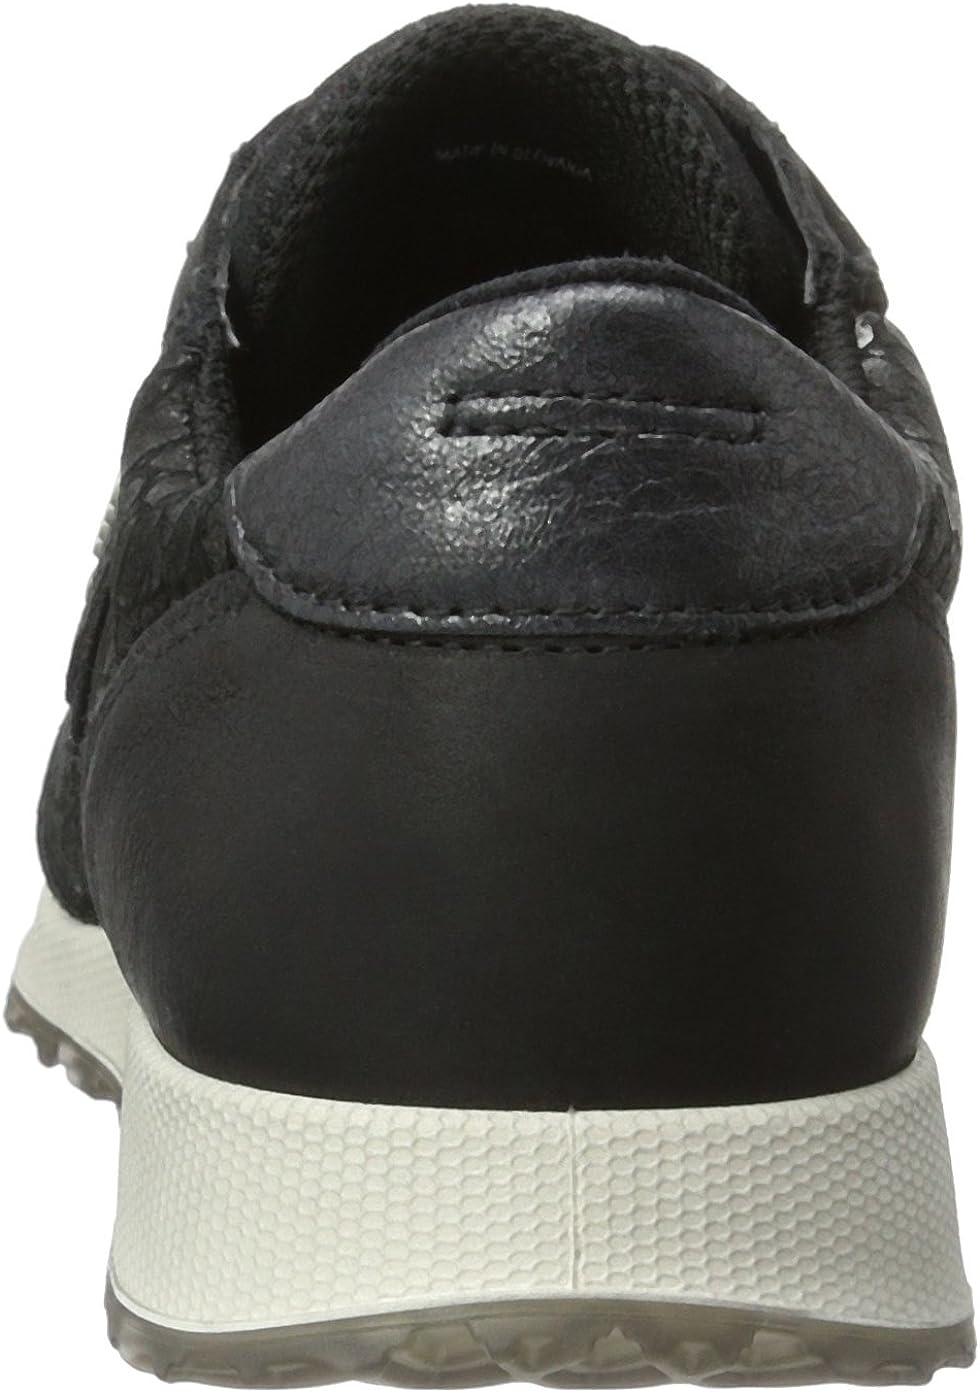 ECCO Damen Sneak Ladies Sneaker Schwarz 50046black Black Black Black